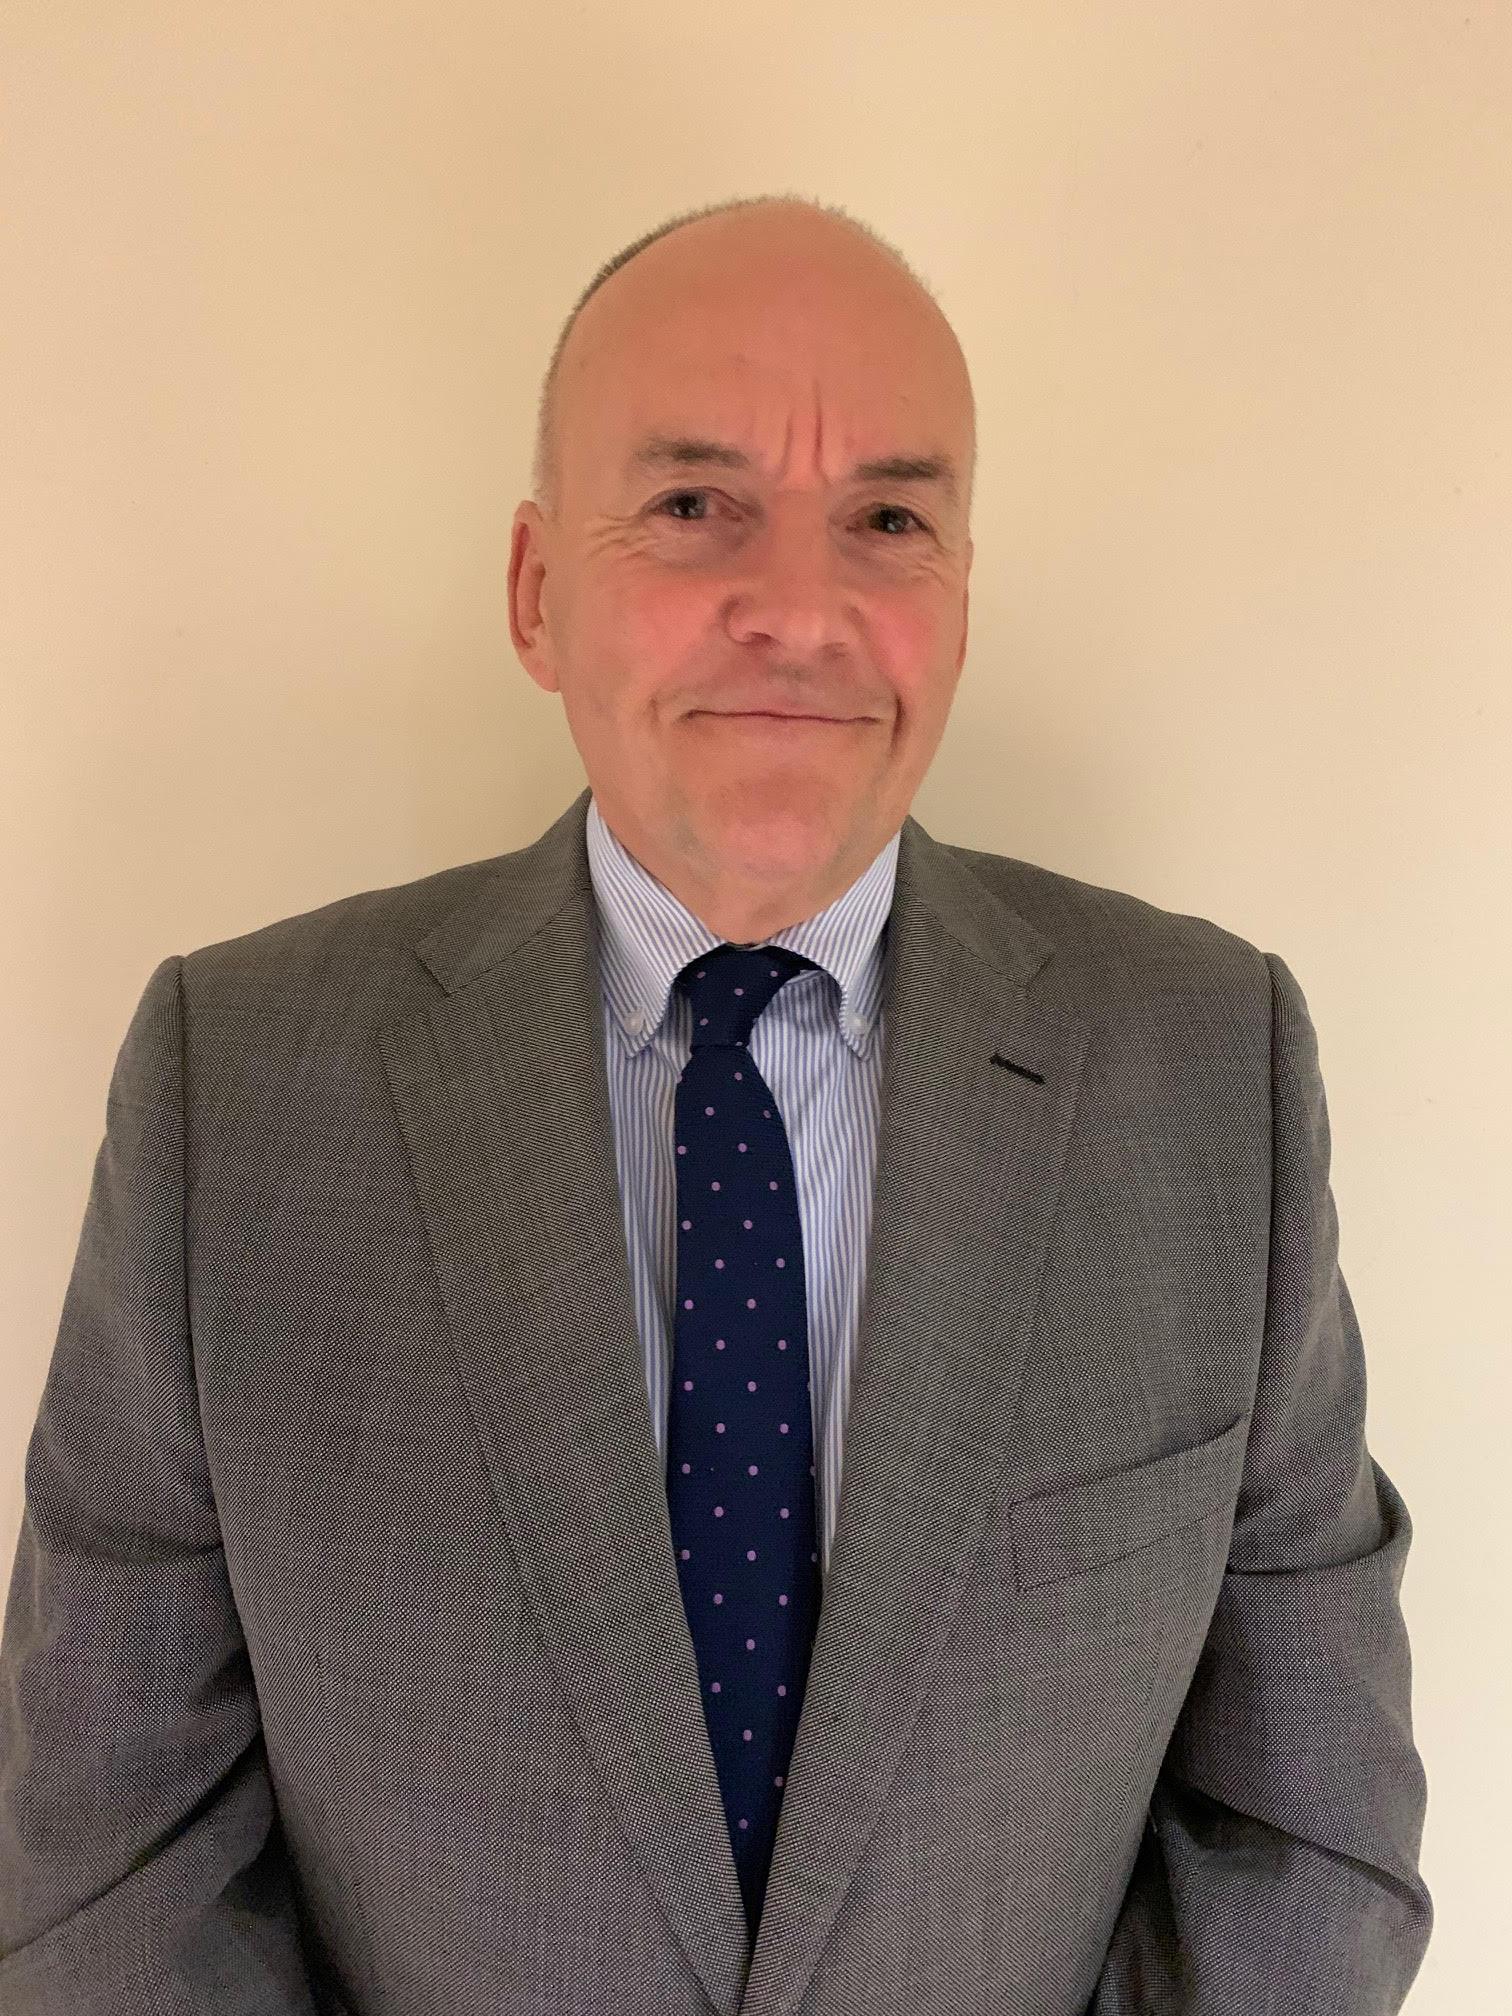 Former Paragon Bank Development Finance Director Joins Brickflow